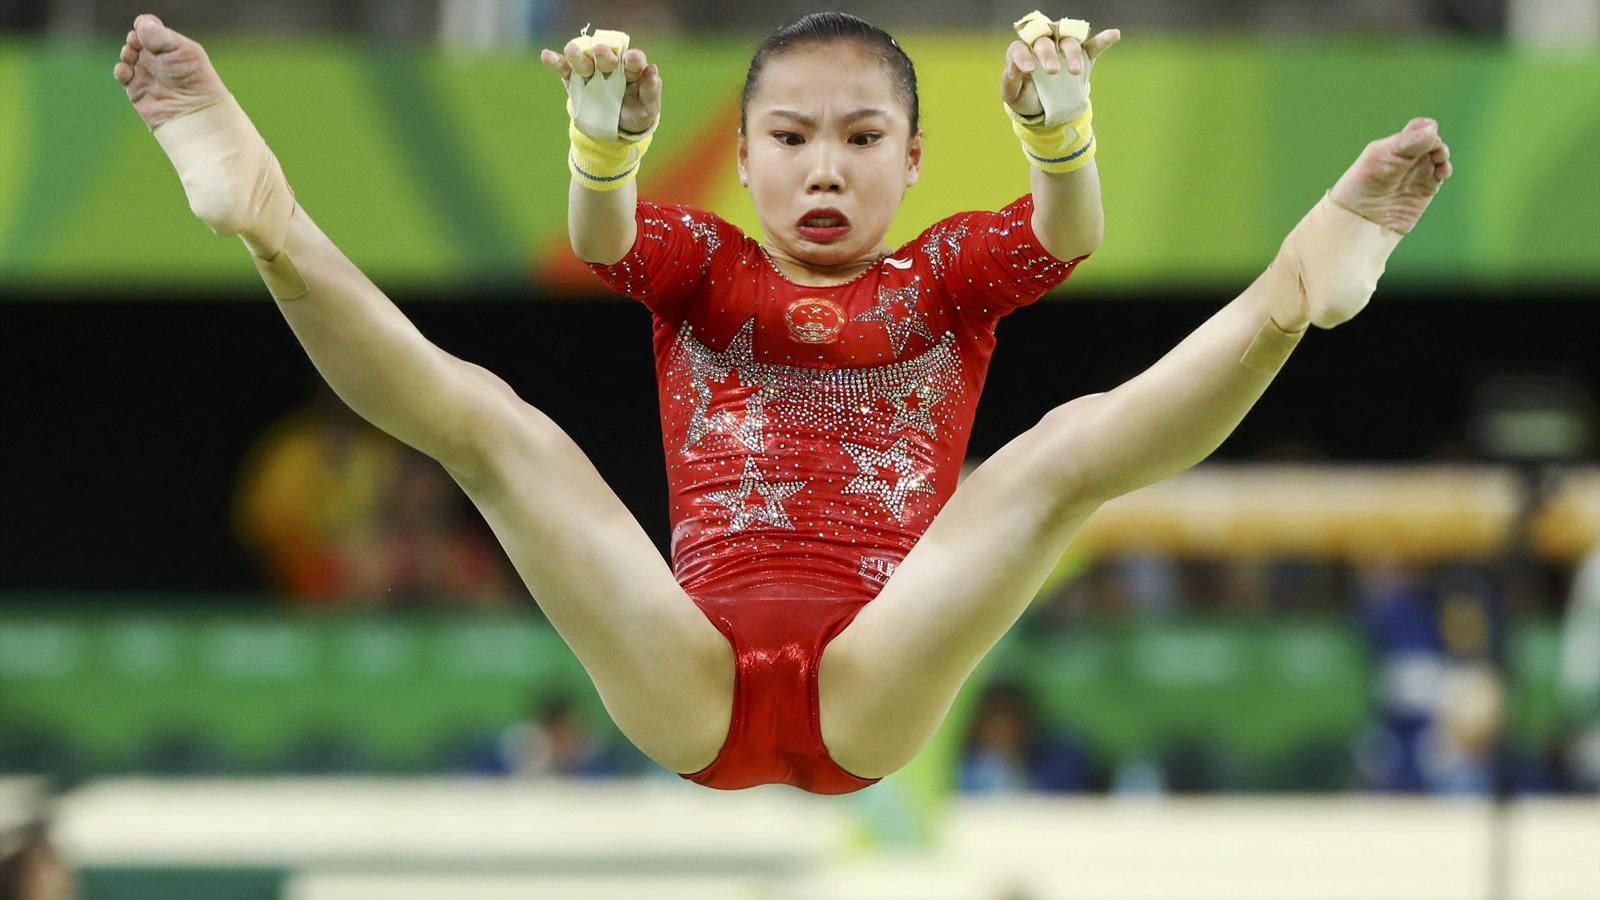 Olympics Rio 2016: Wobbles and stumbles ruin China's day - Rio 2016 - Artistic Gymnastics ...